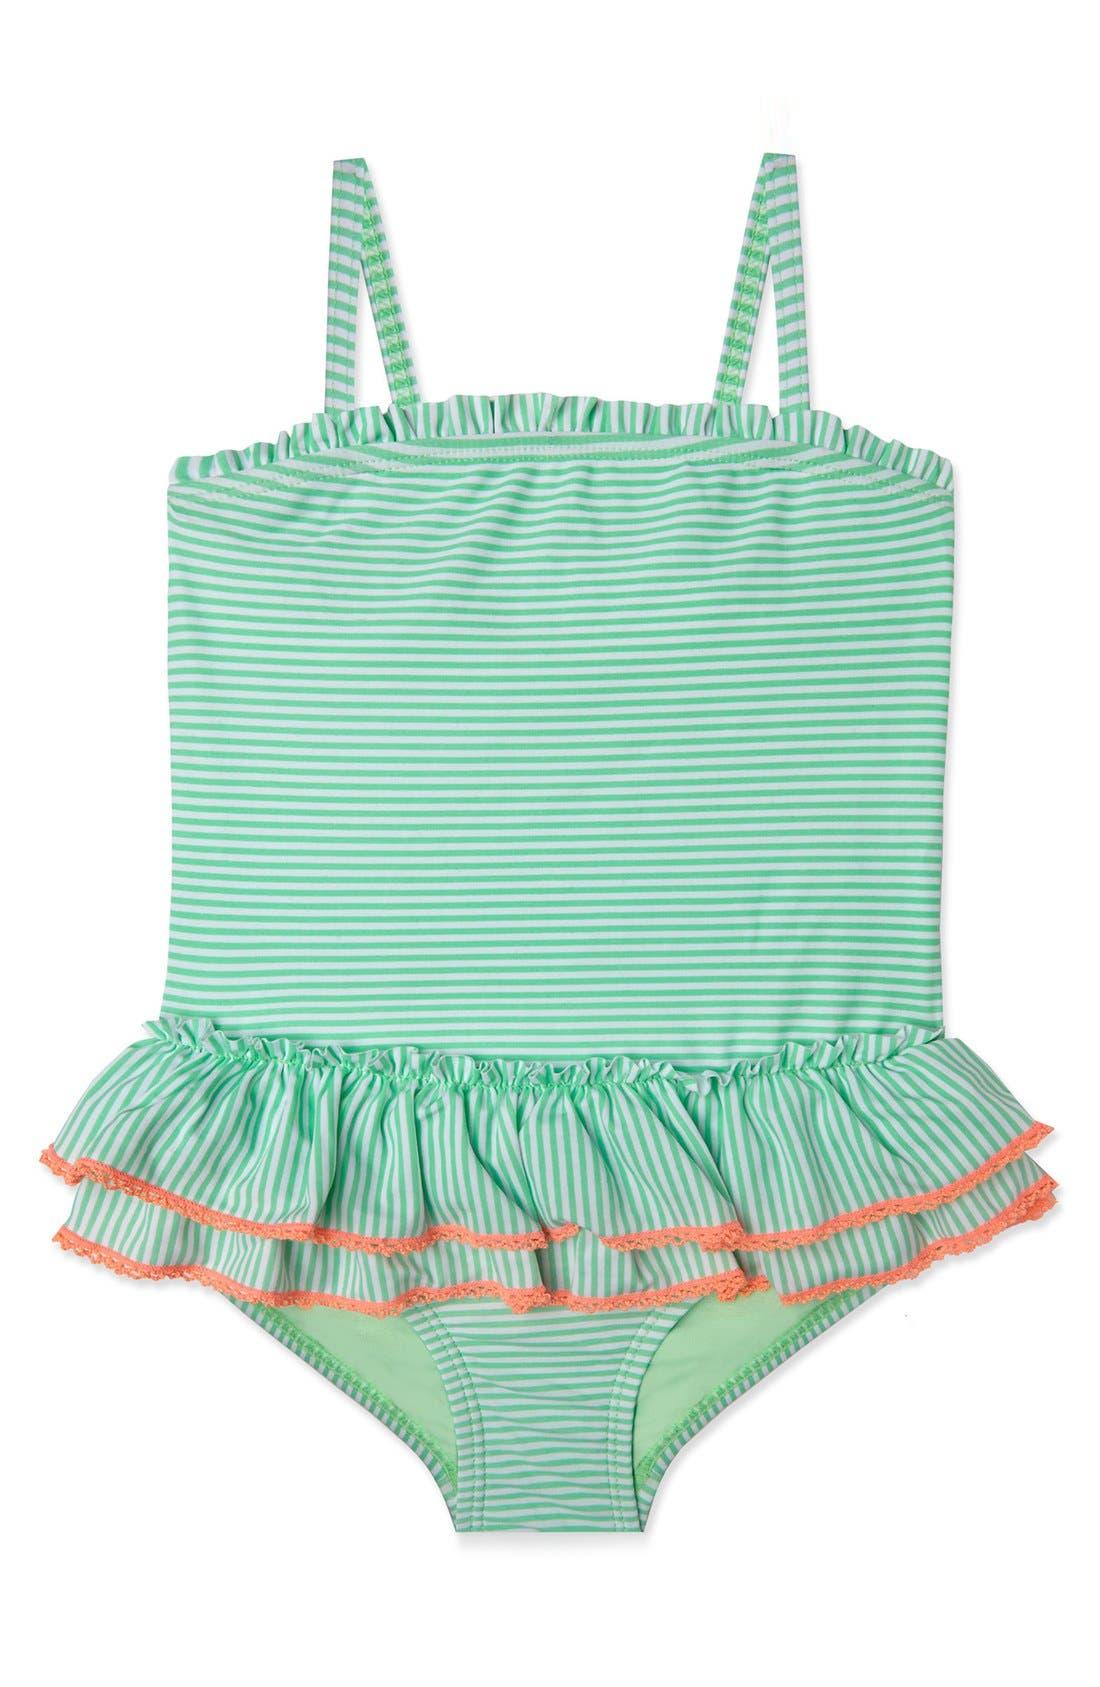 Main Image - Hula Star 'Sailor Stripe' One-Piece Swimsuit (Toddler Girls & Little Girls)